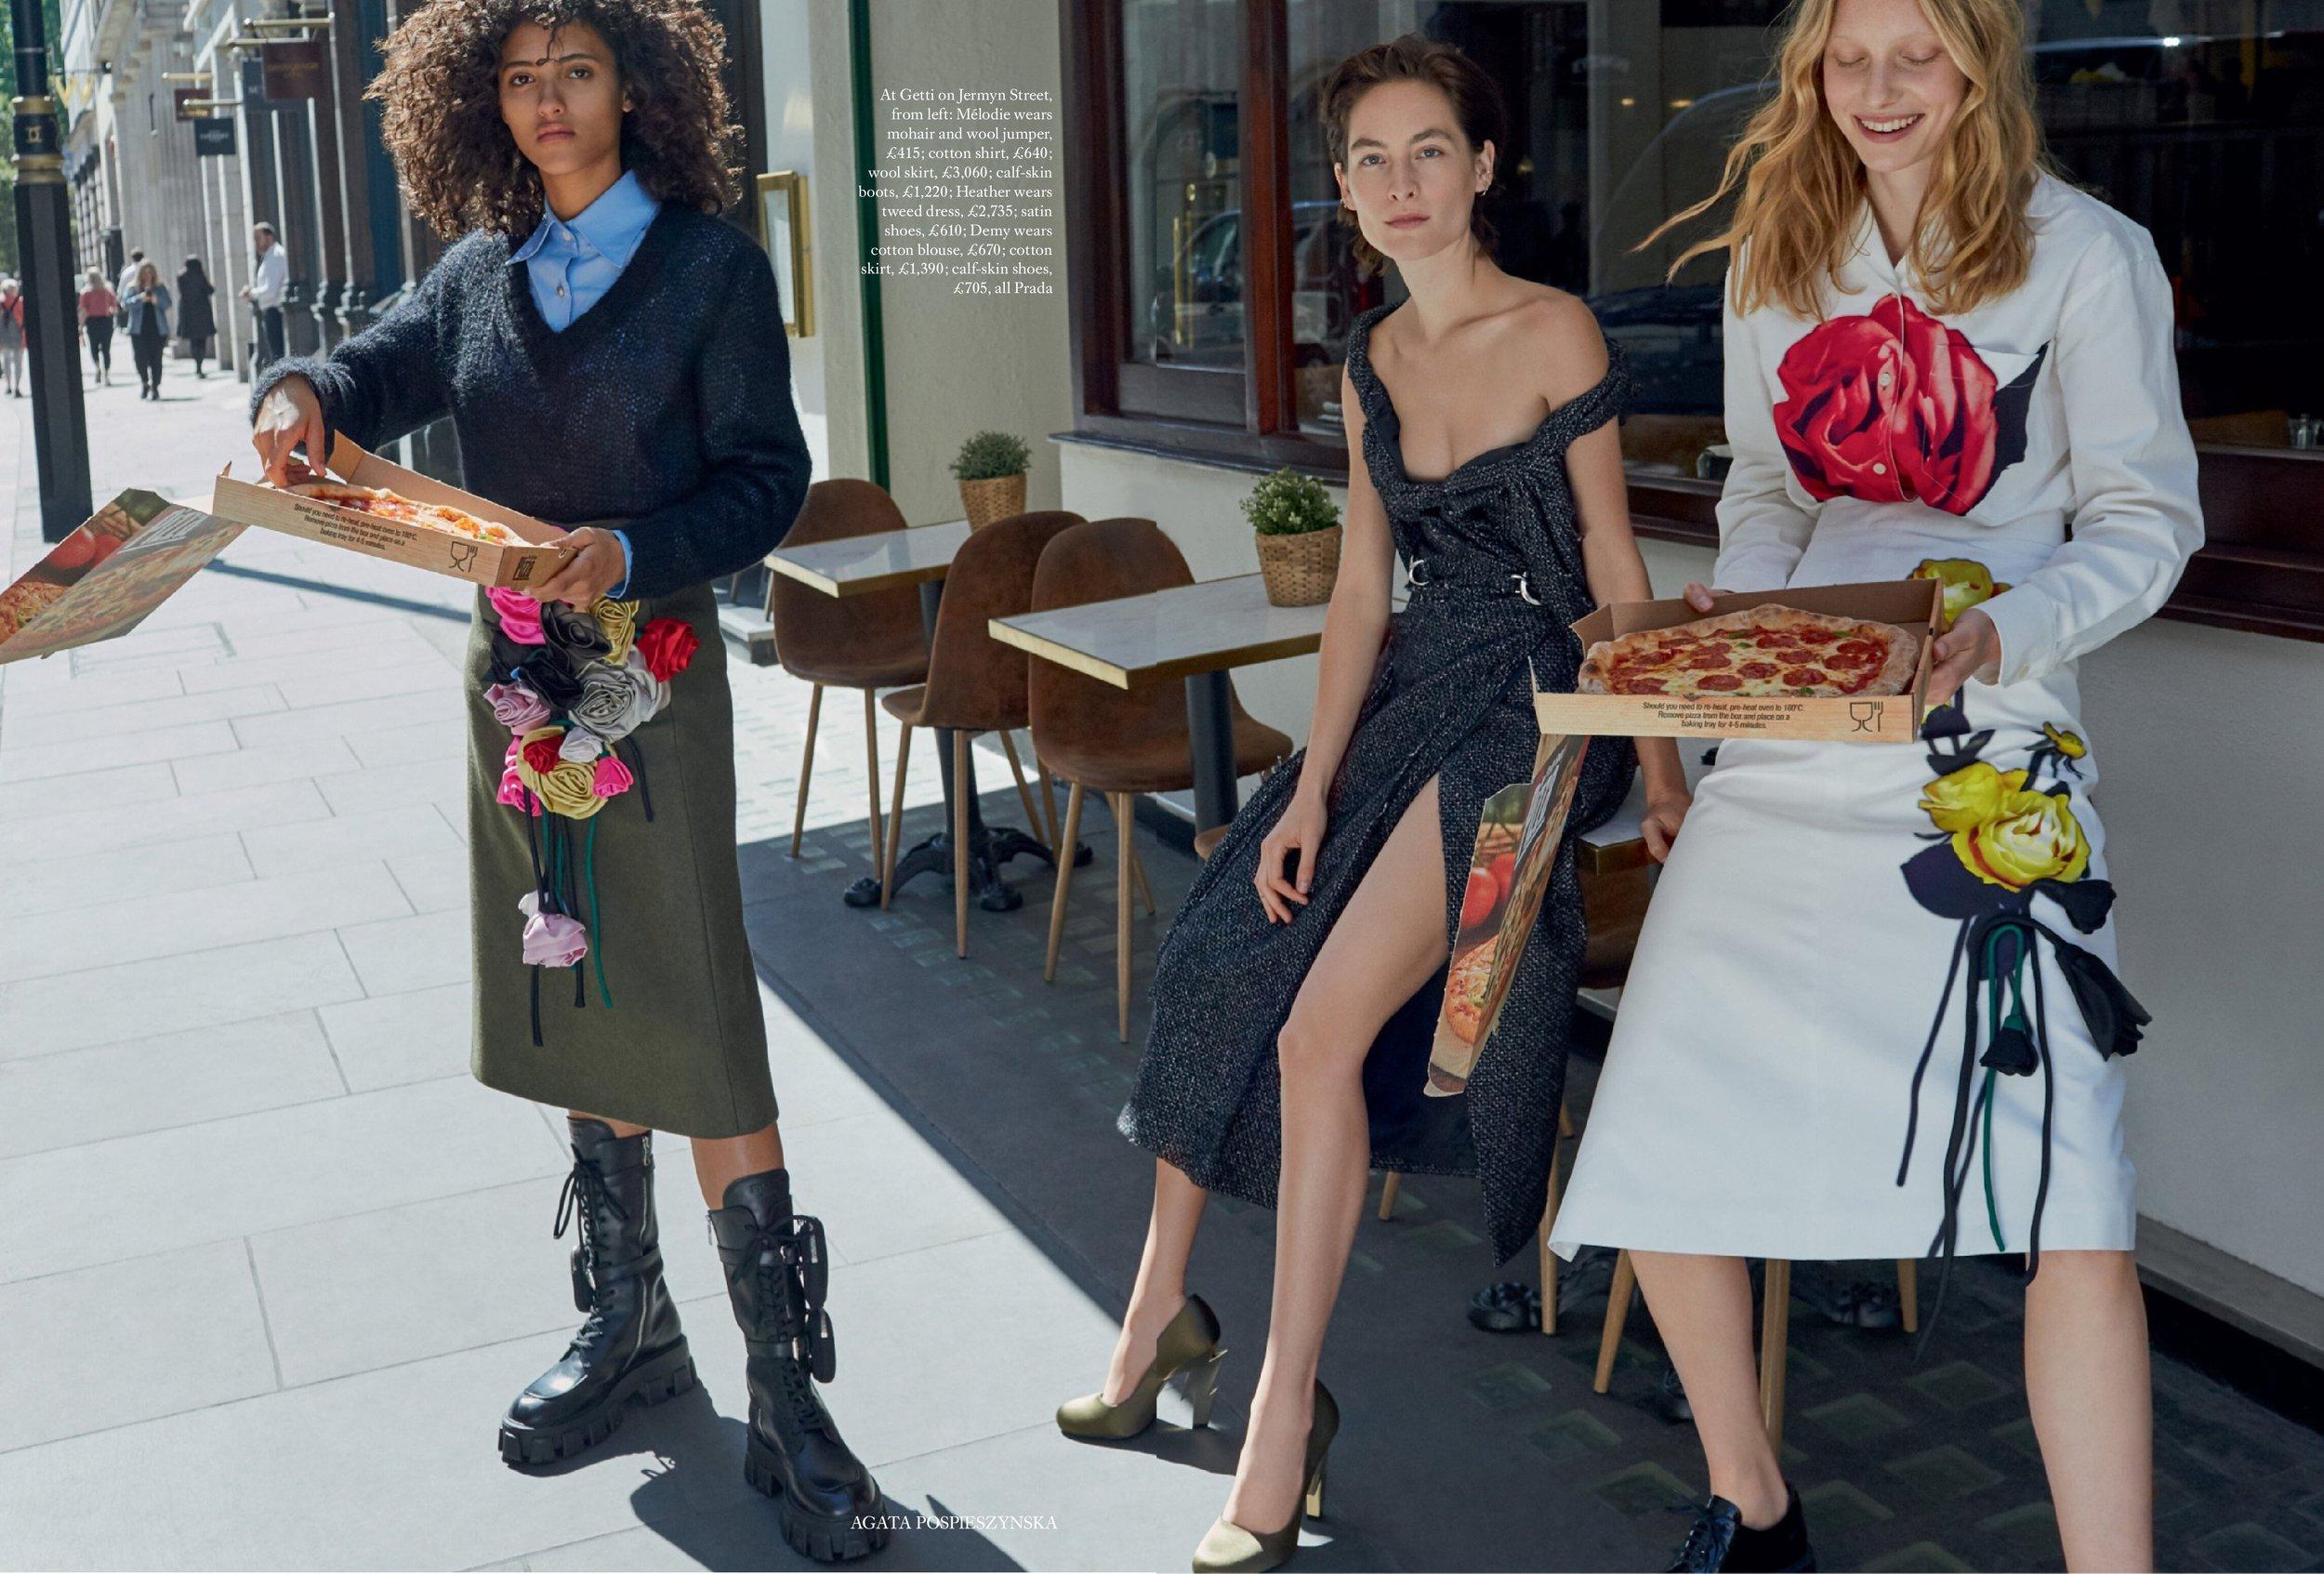 Agata Popieszynska-Girls Are Back in Town Harper's Bazaar UK Aug 2019 (42).jpg